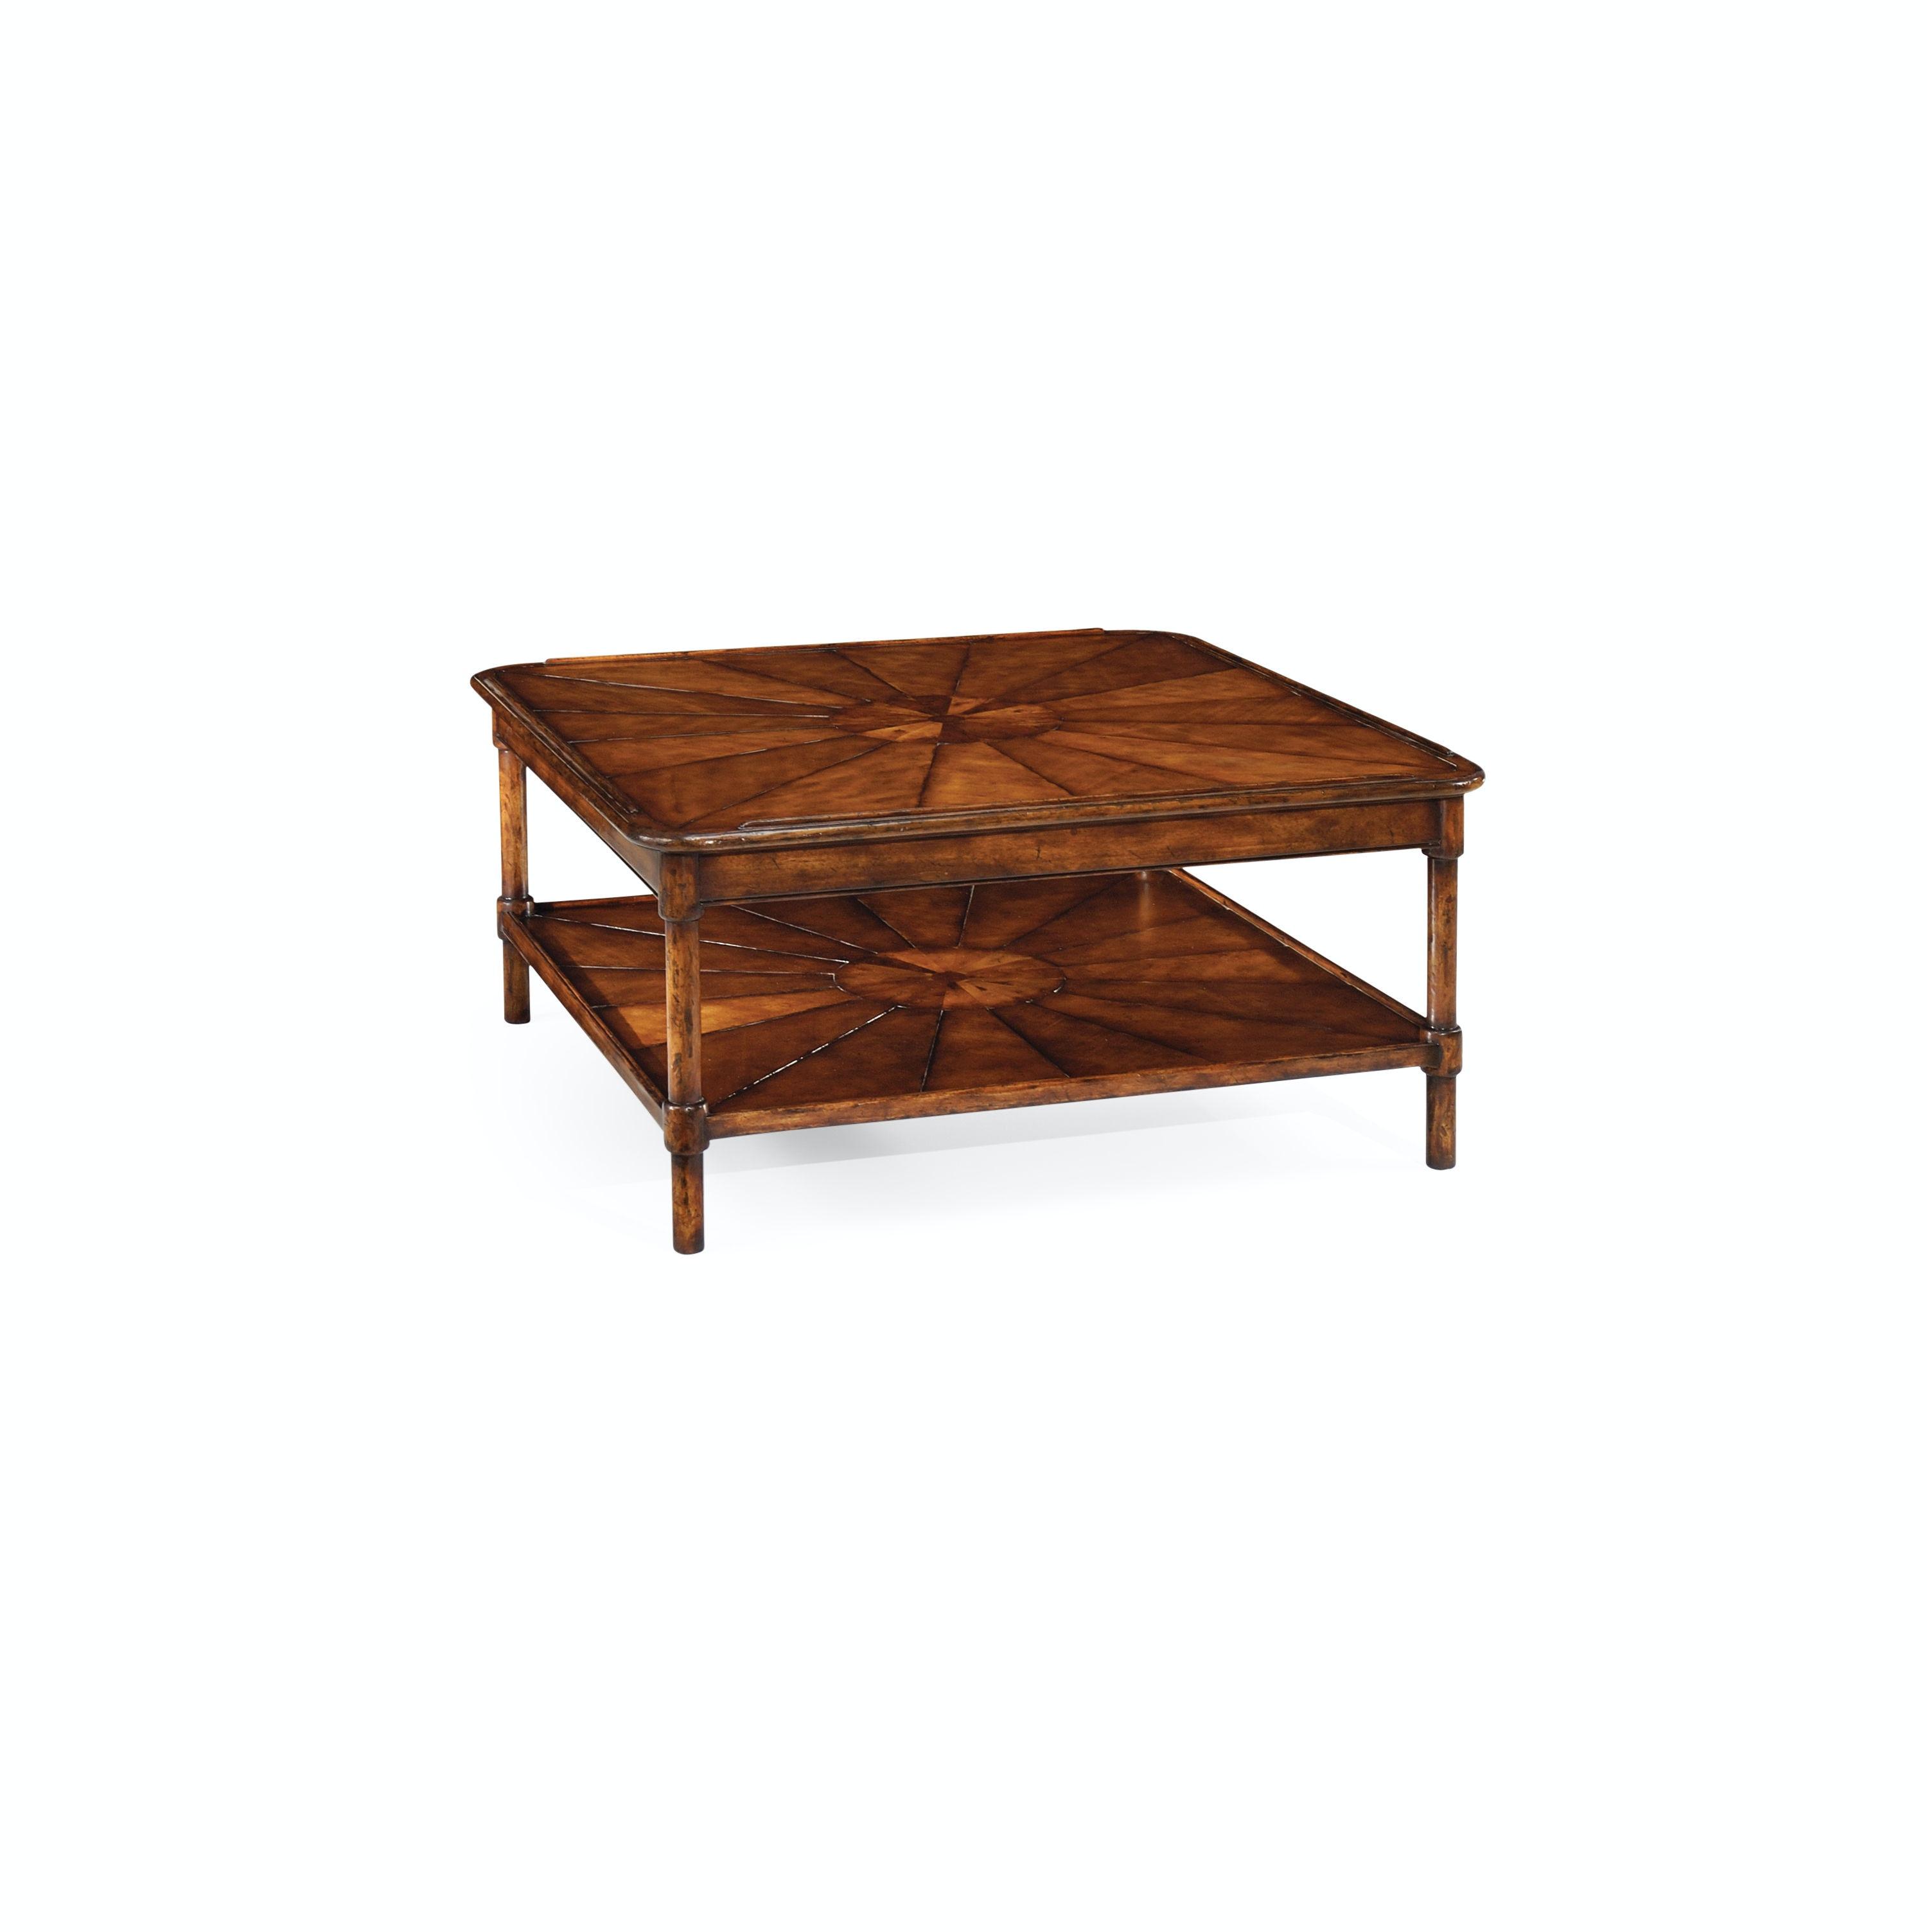 jonathan charles living room square rustic walnut coffee table qj492599wal walter e smithe furniture design